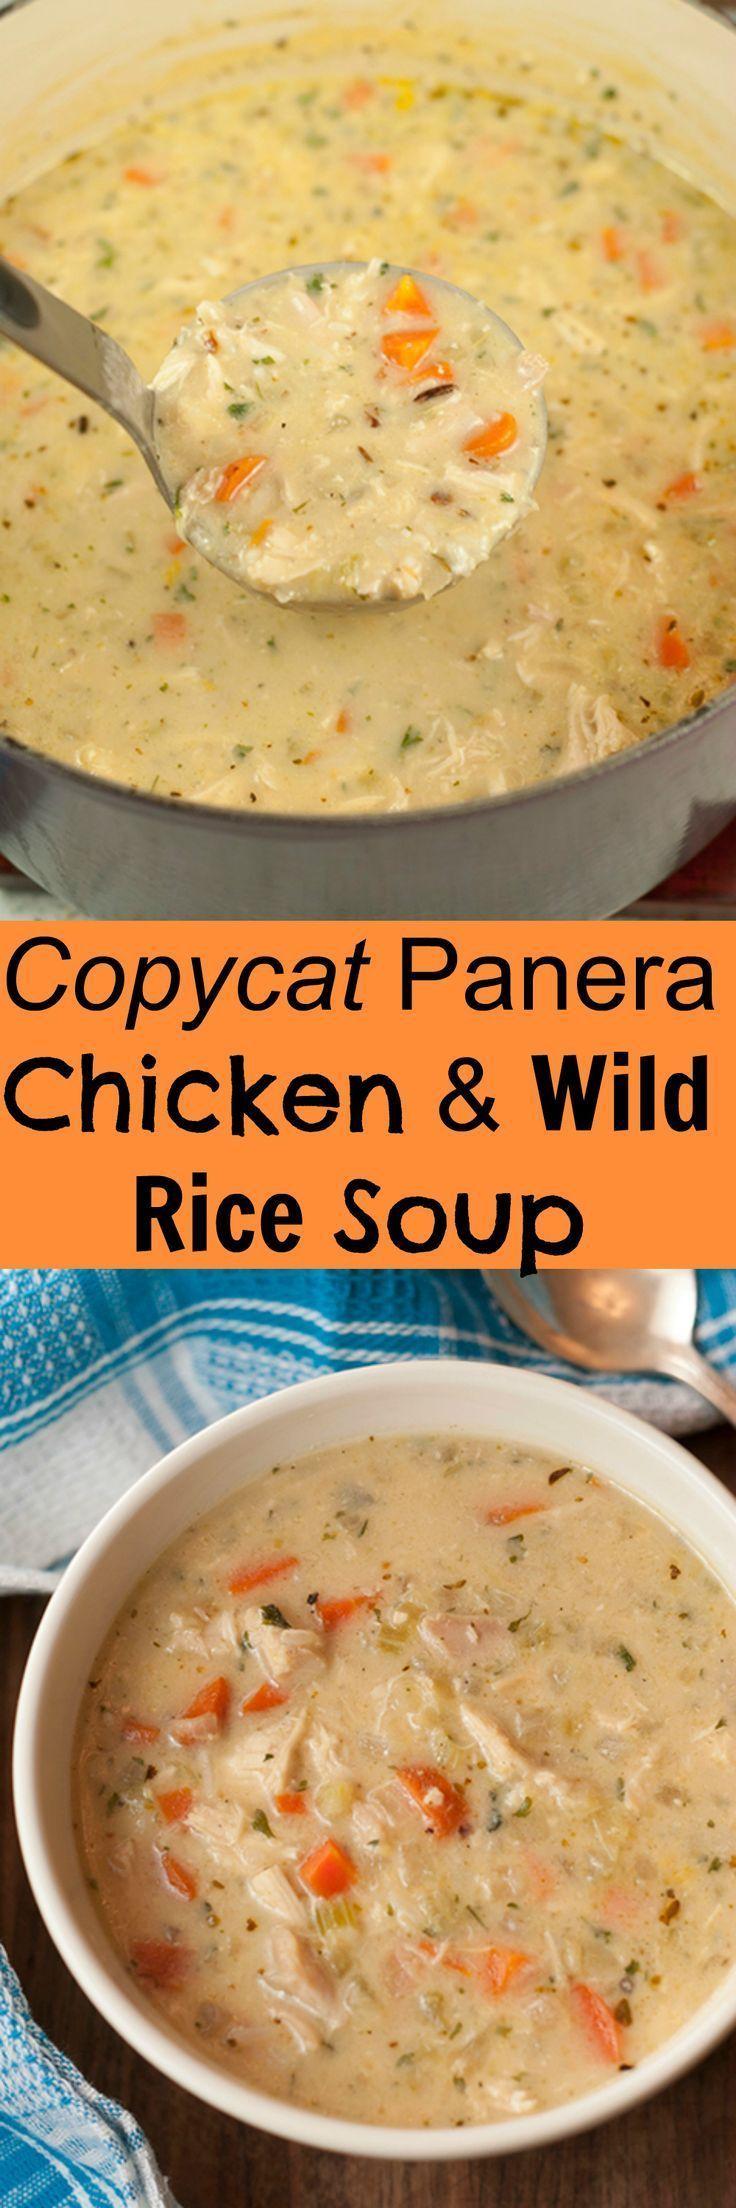 Copycat Panera Chicken & Wild Rice Soup   Recipe   Food ...